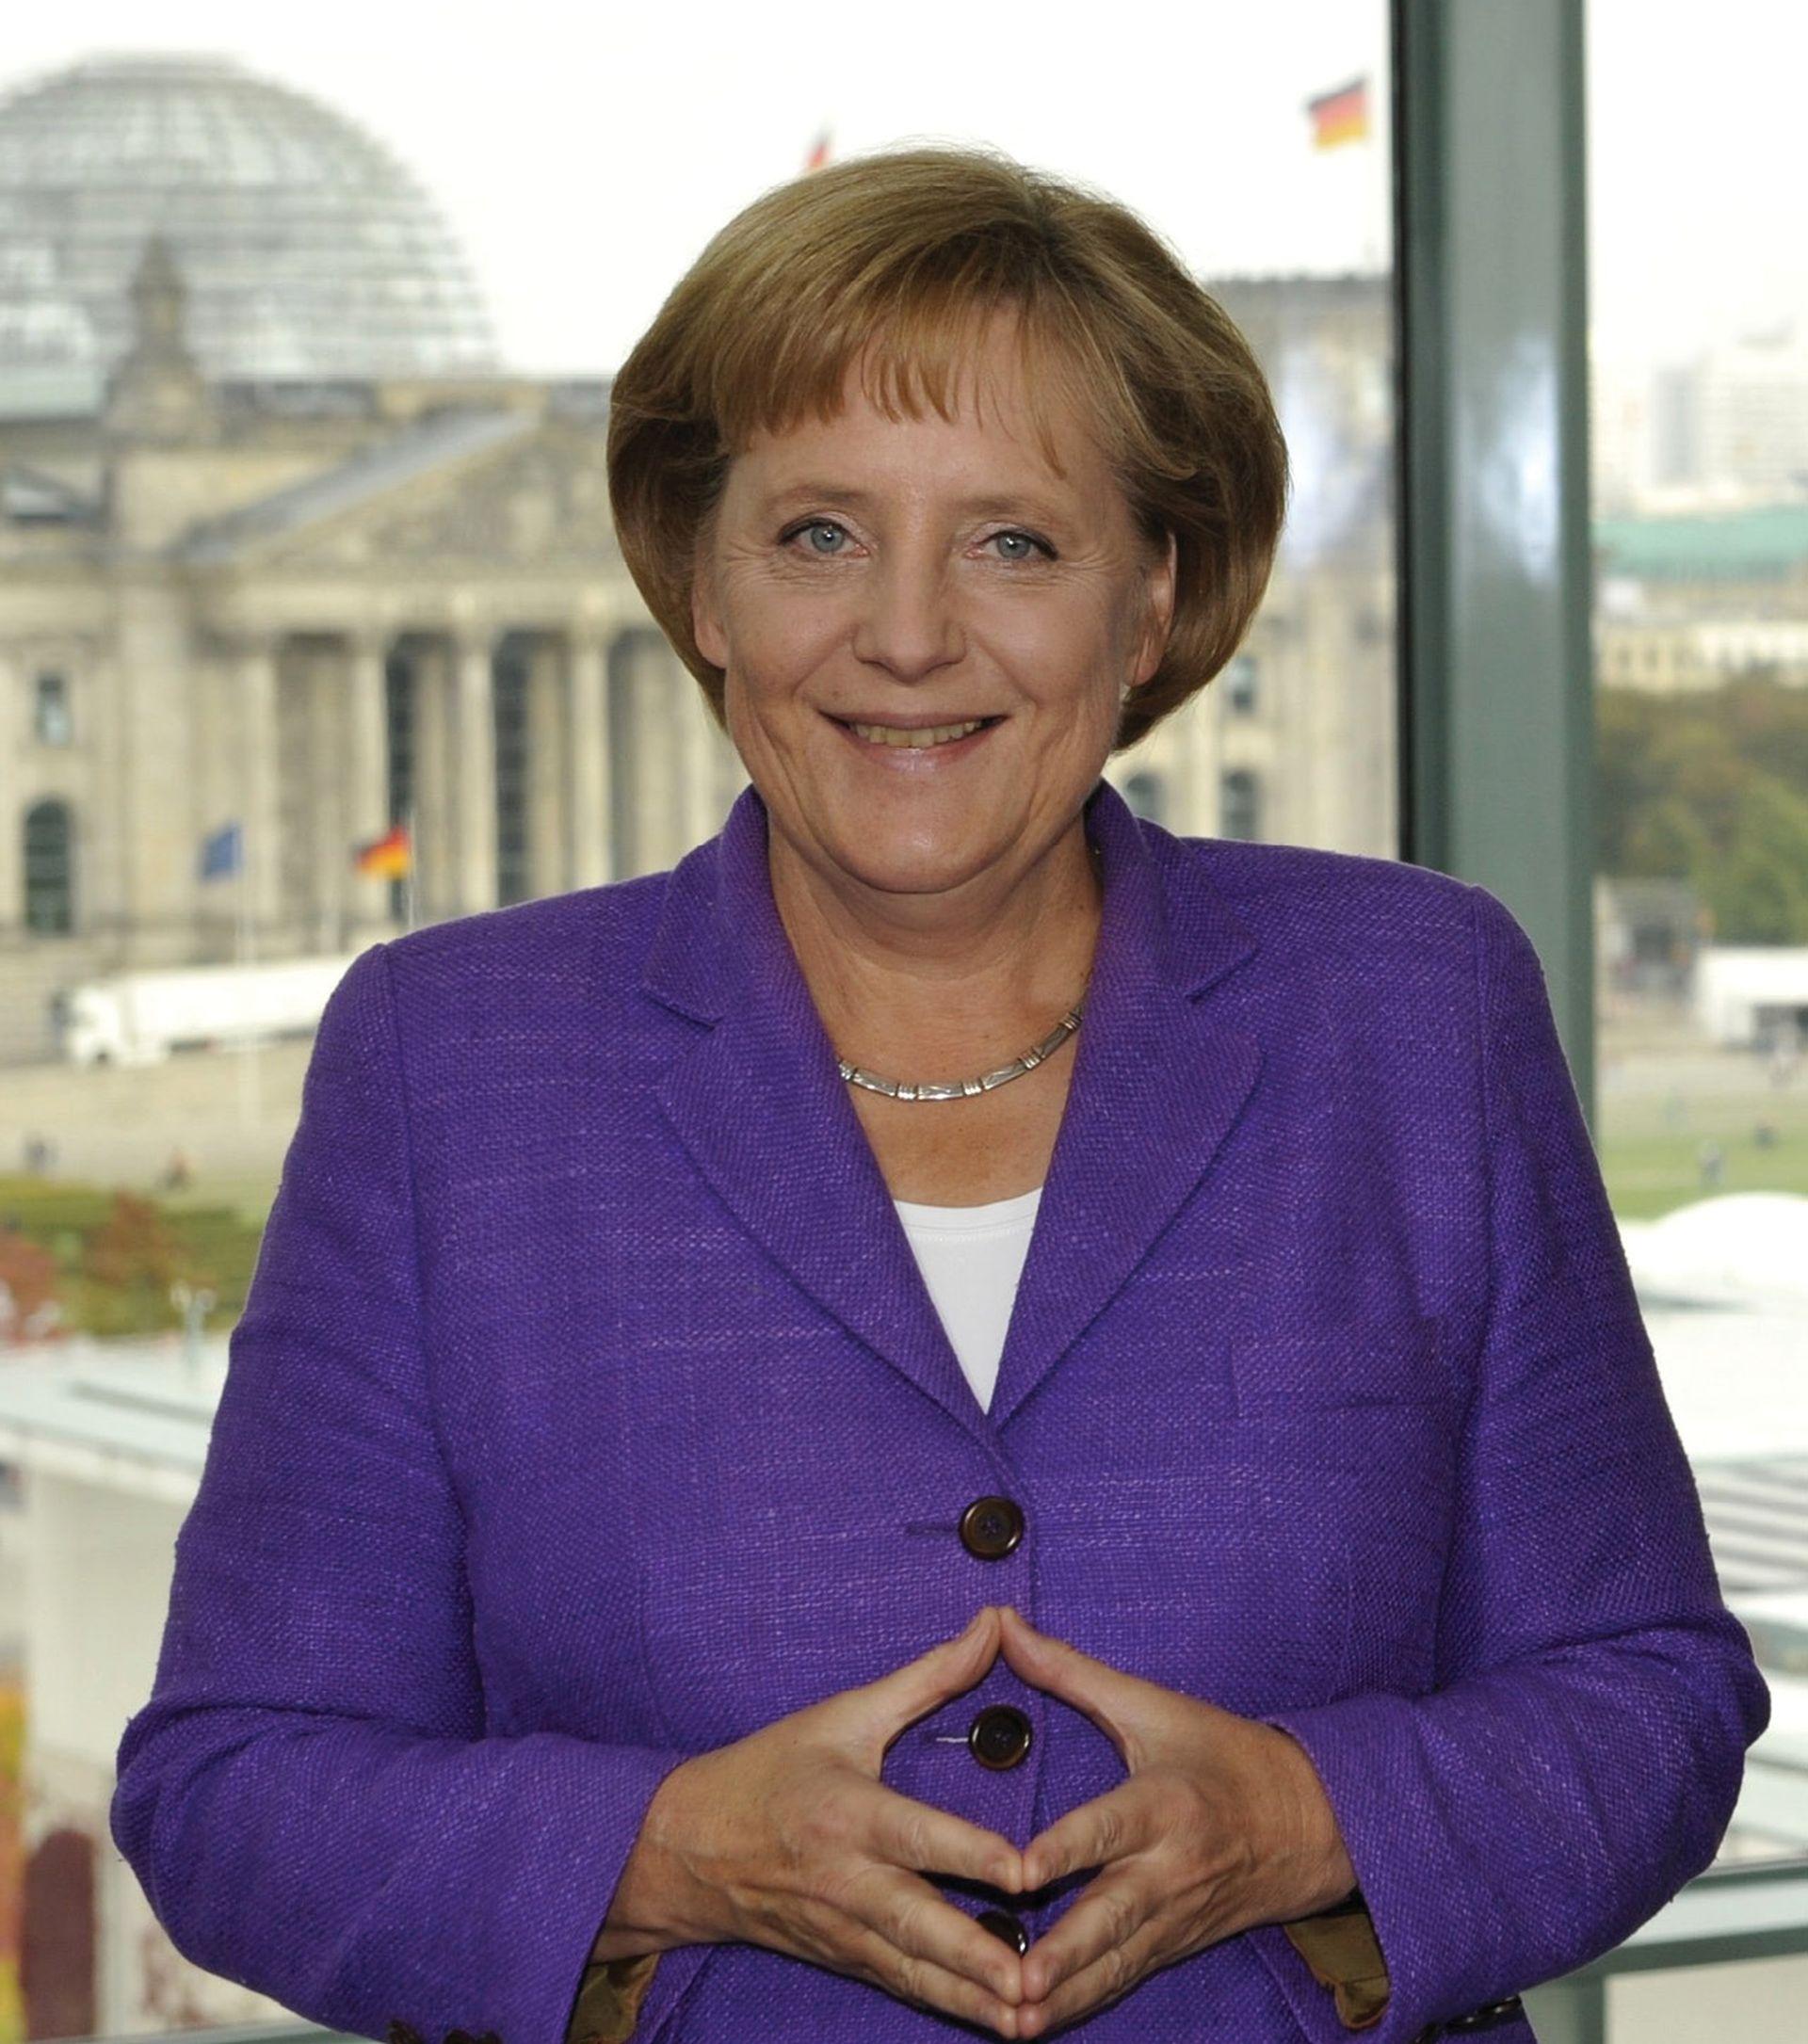 FELJTON Tajna njemačke superiornosti